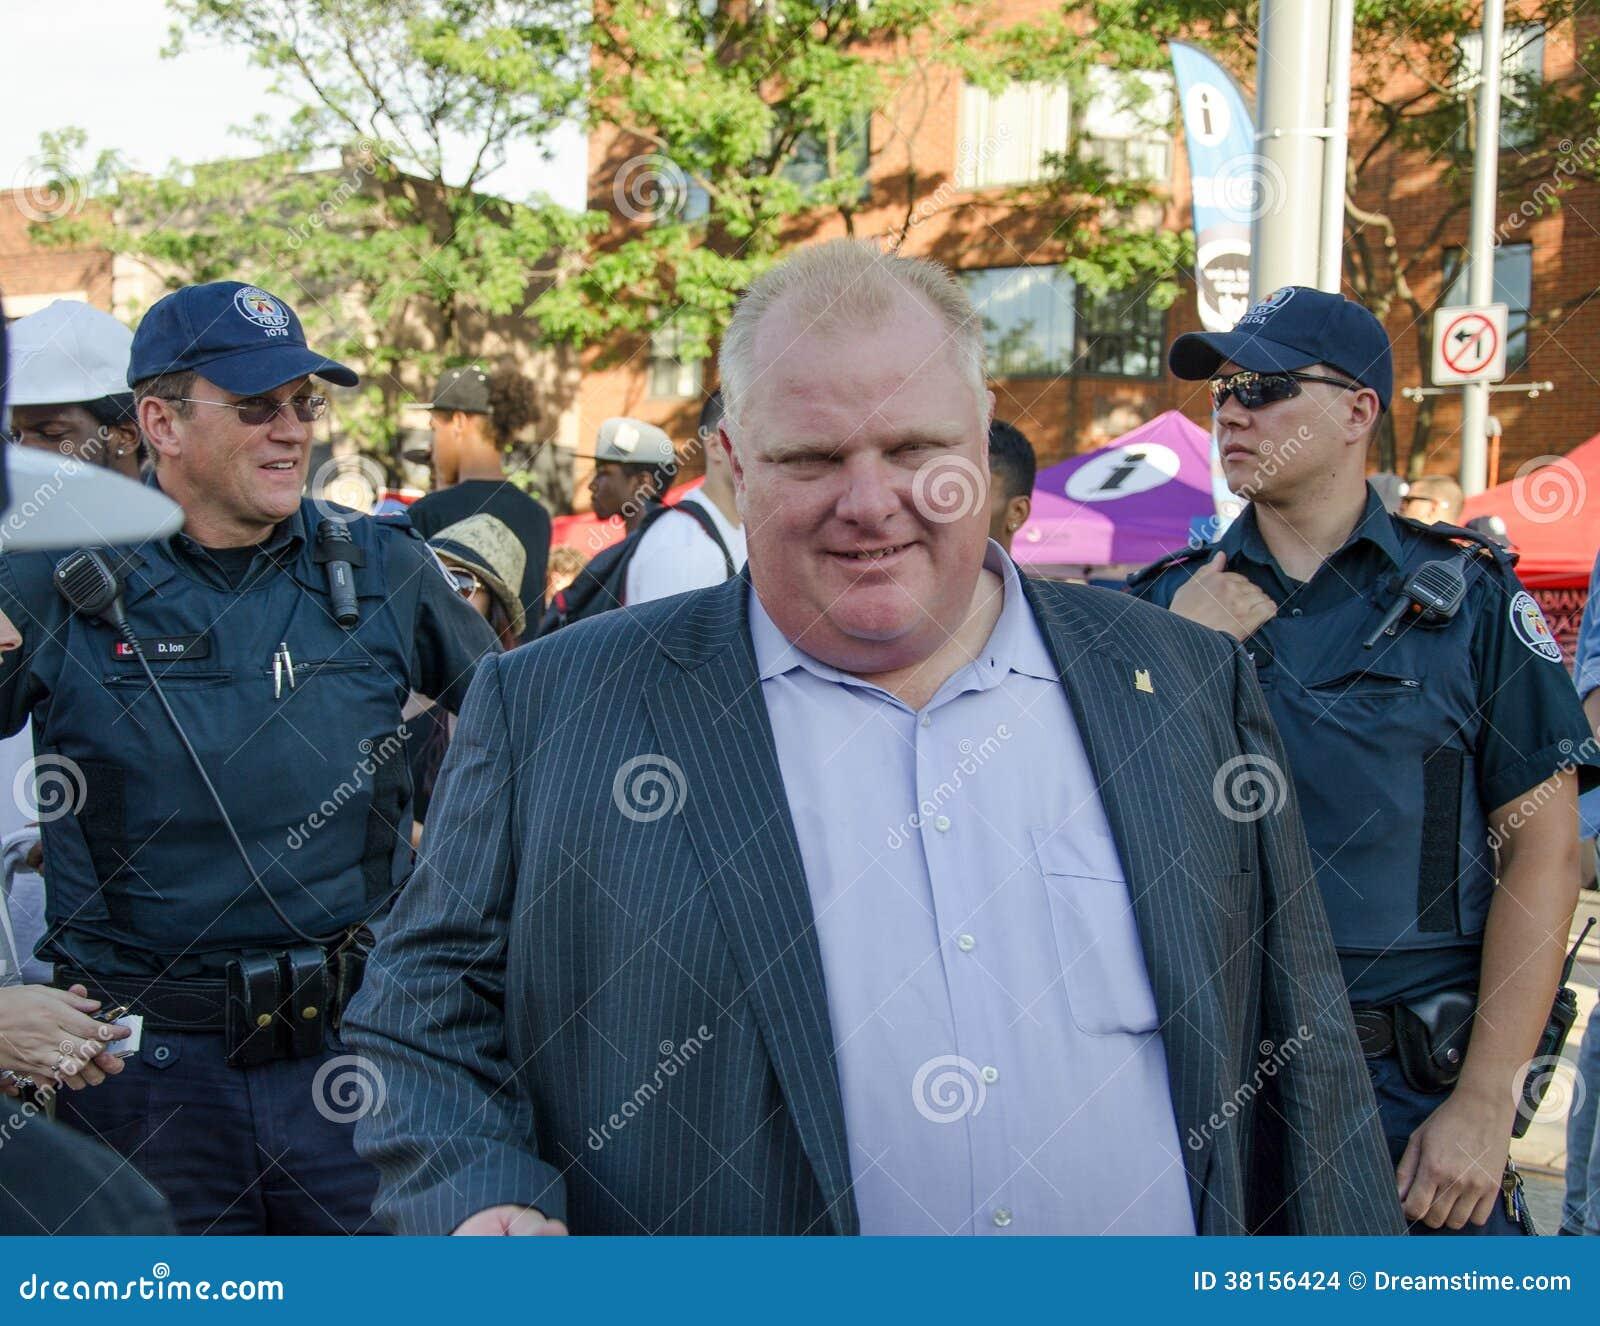 Mayor of Toronto Rob Ford visits Salsa on St. Clair